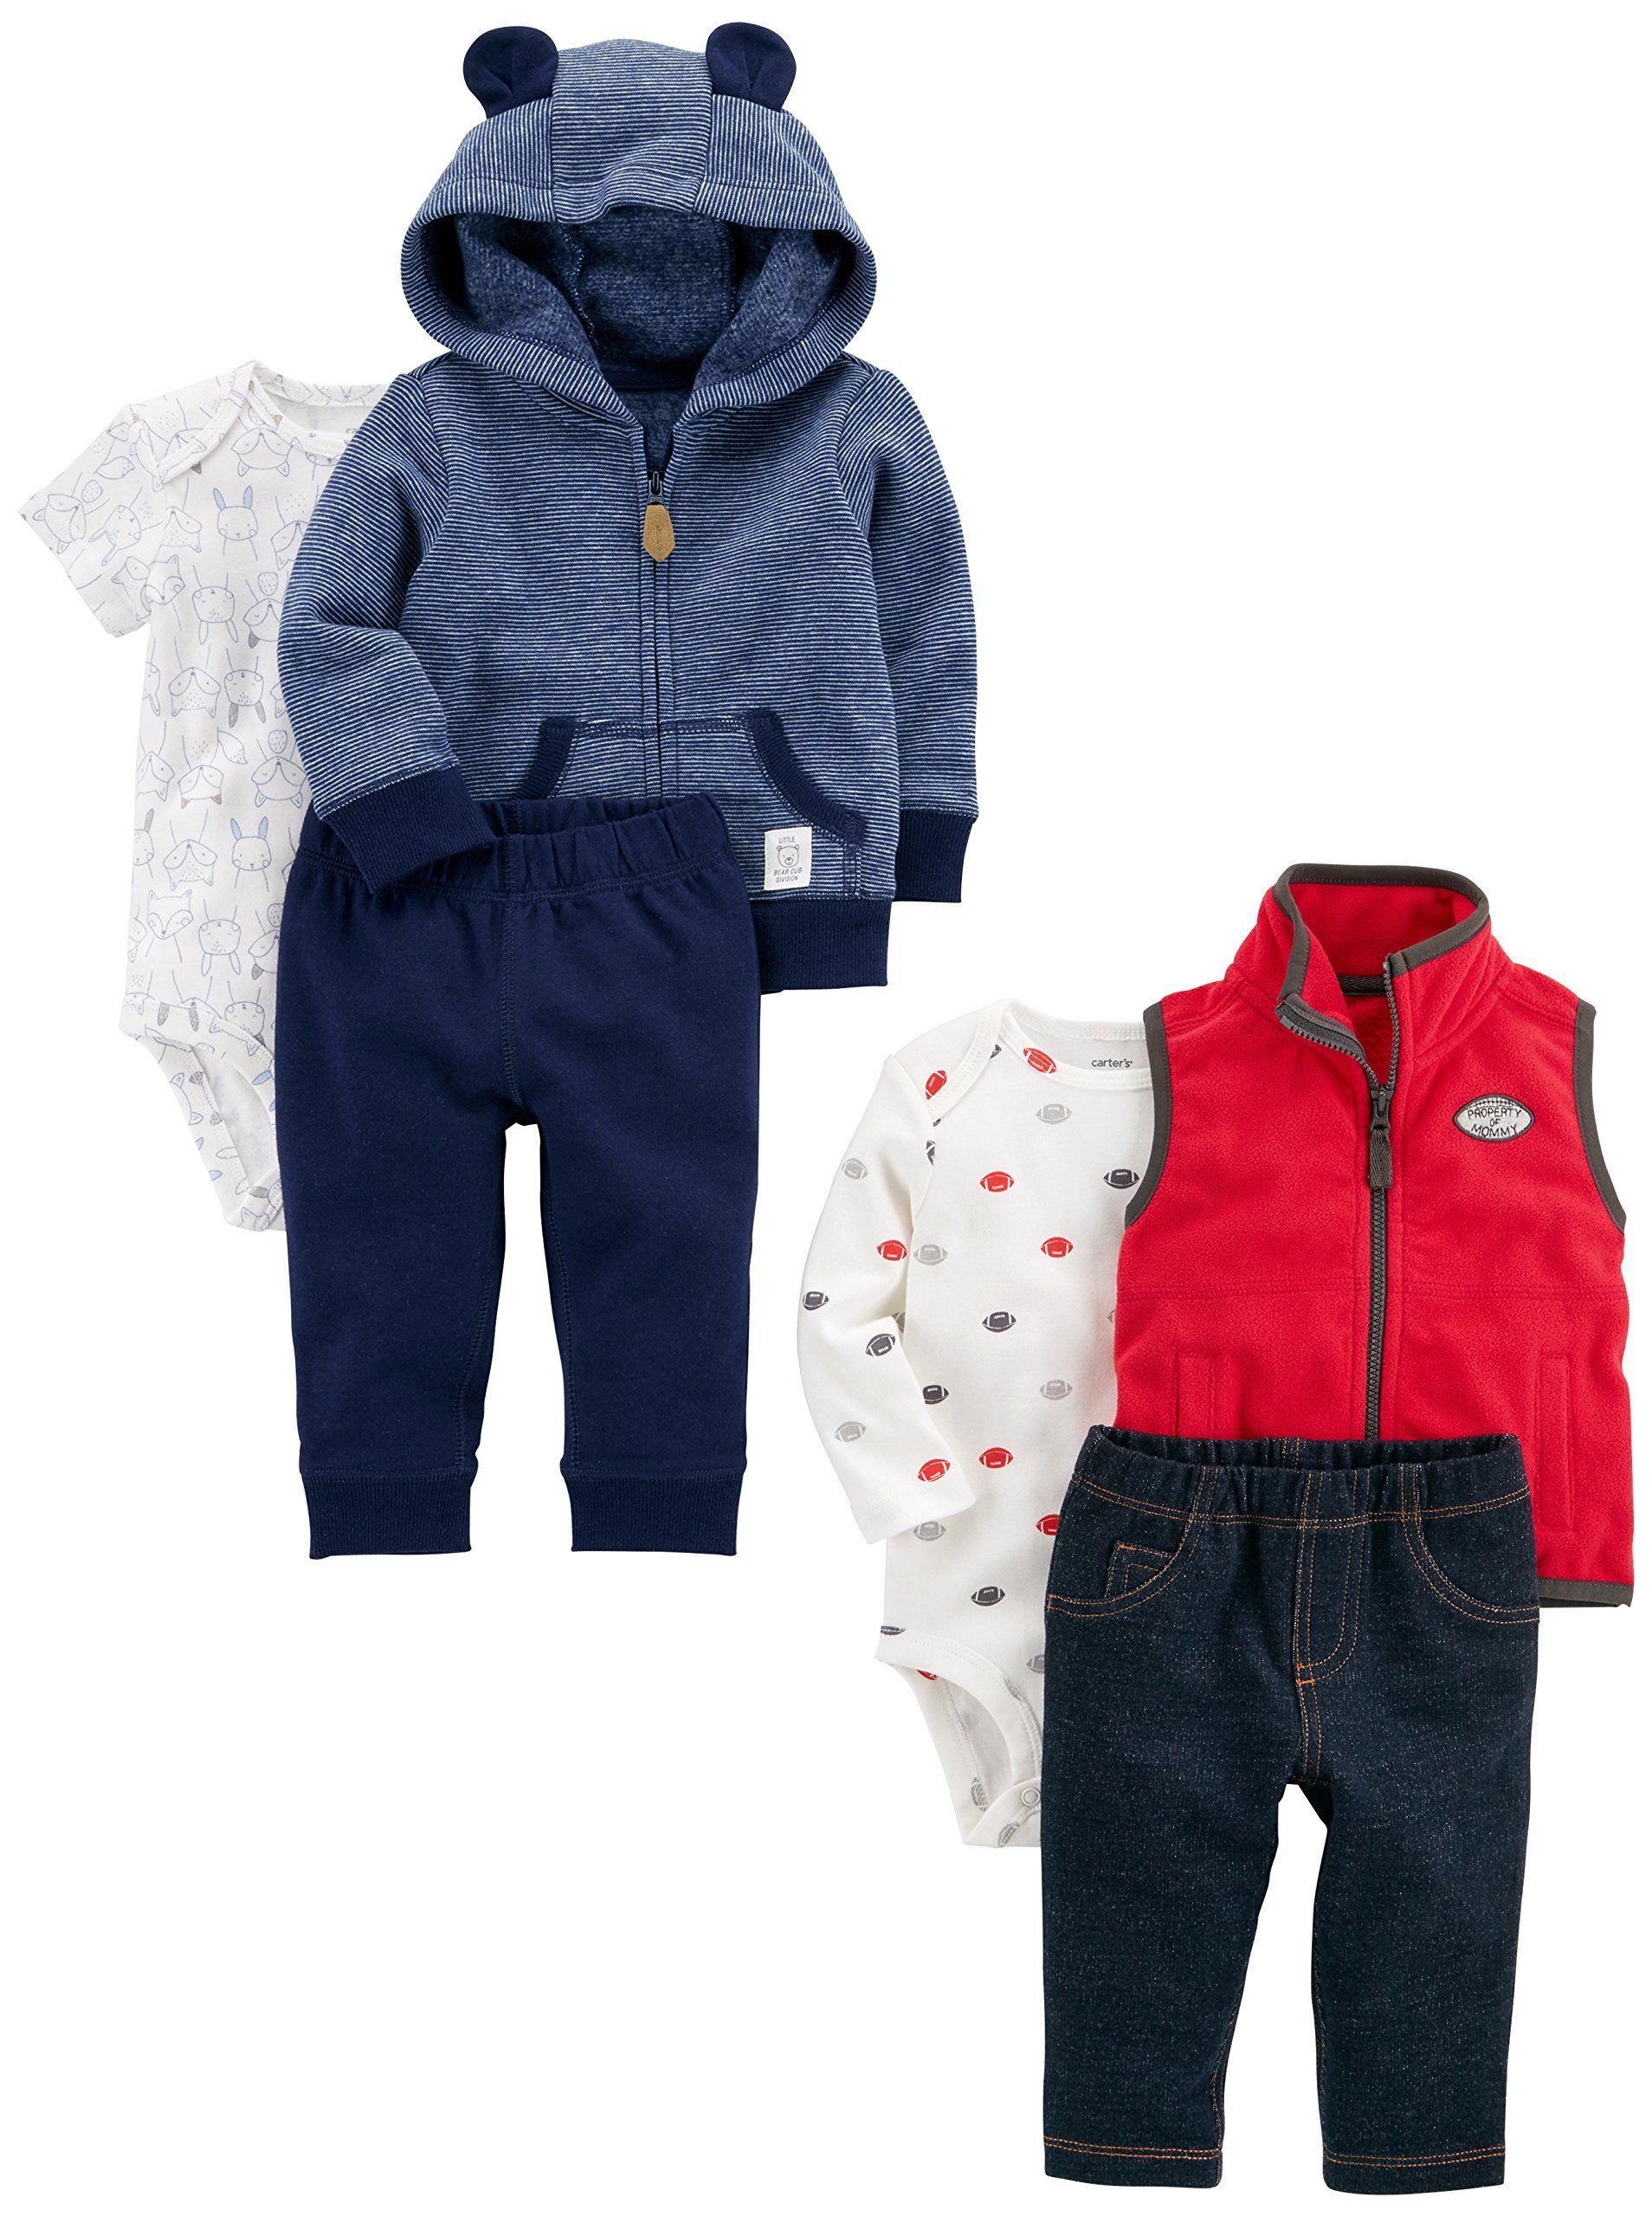 Carter s Baby Boys 6 Piece Jacket and Vest Set Navy Stripe Red 12